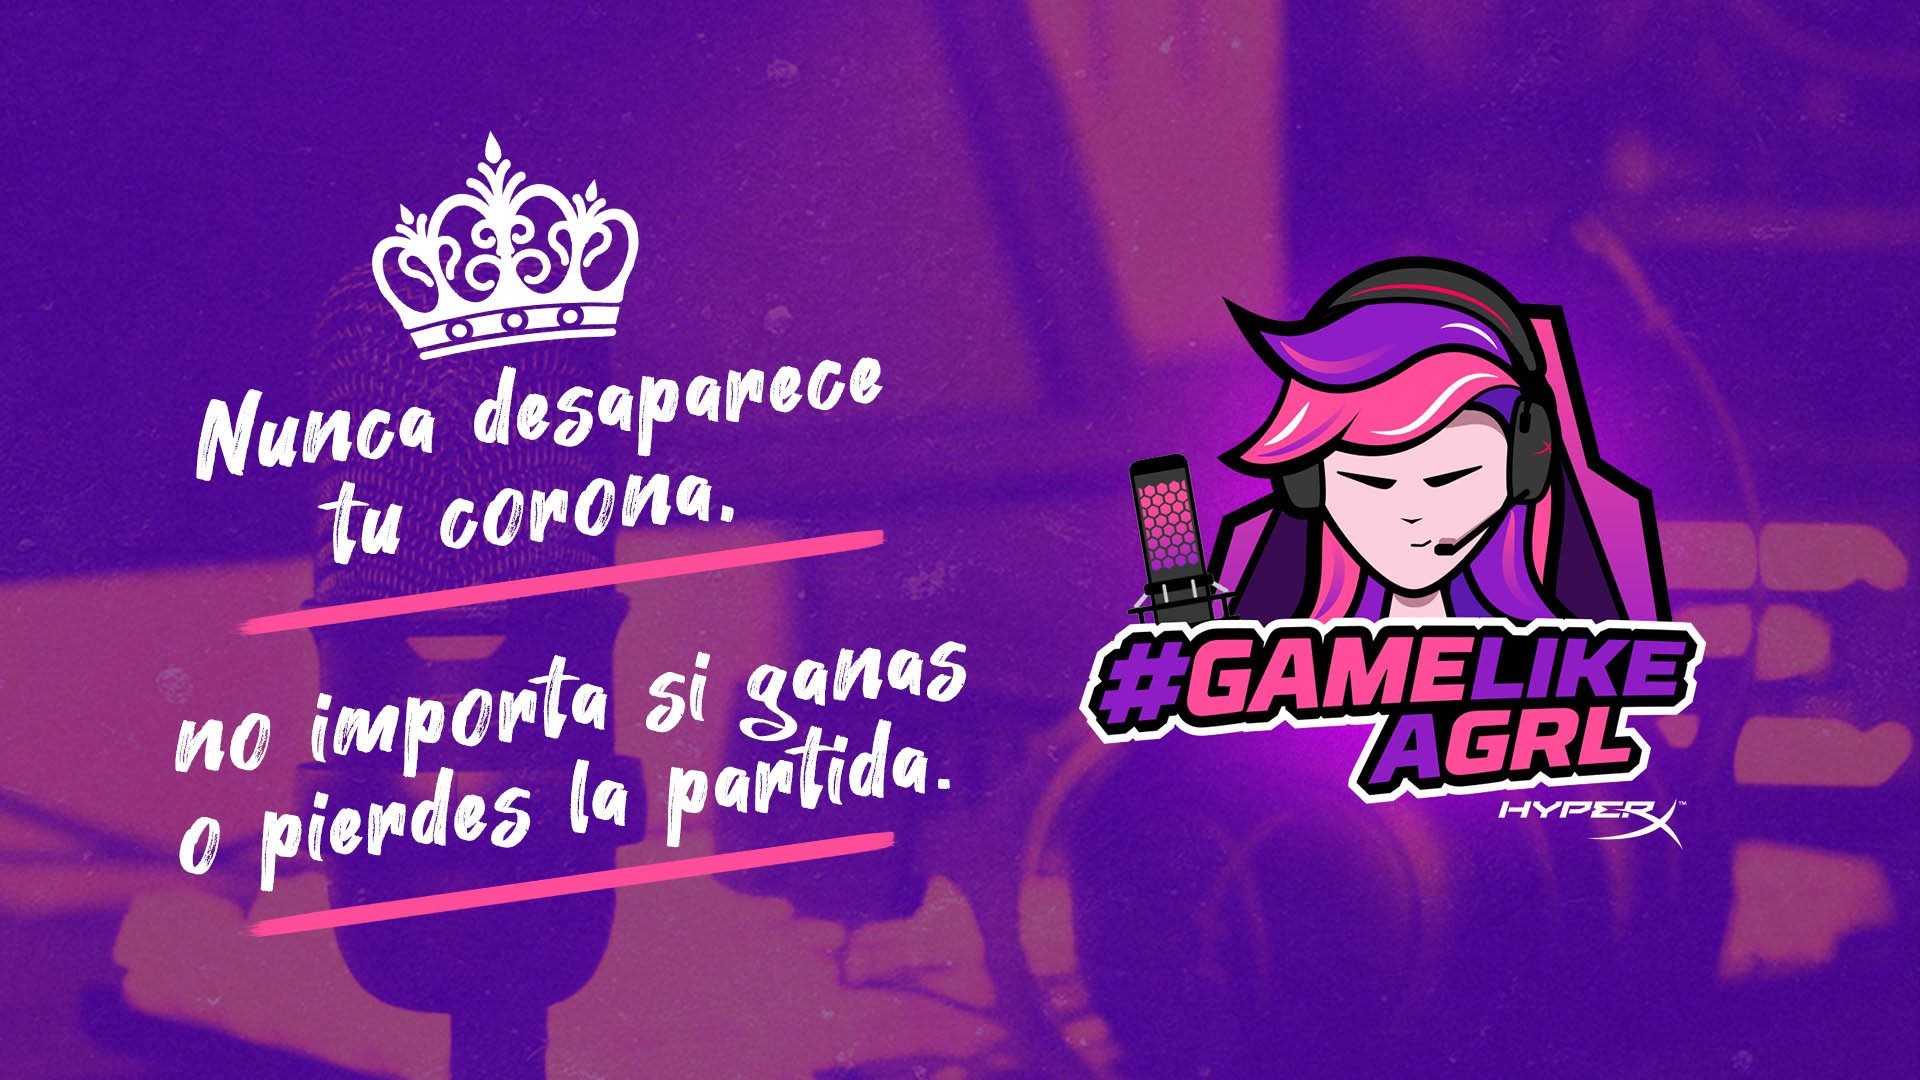 #GameLikeAGrl